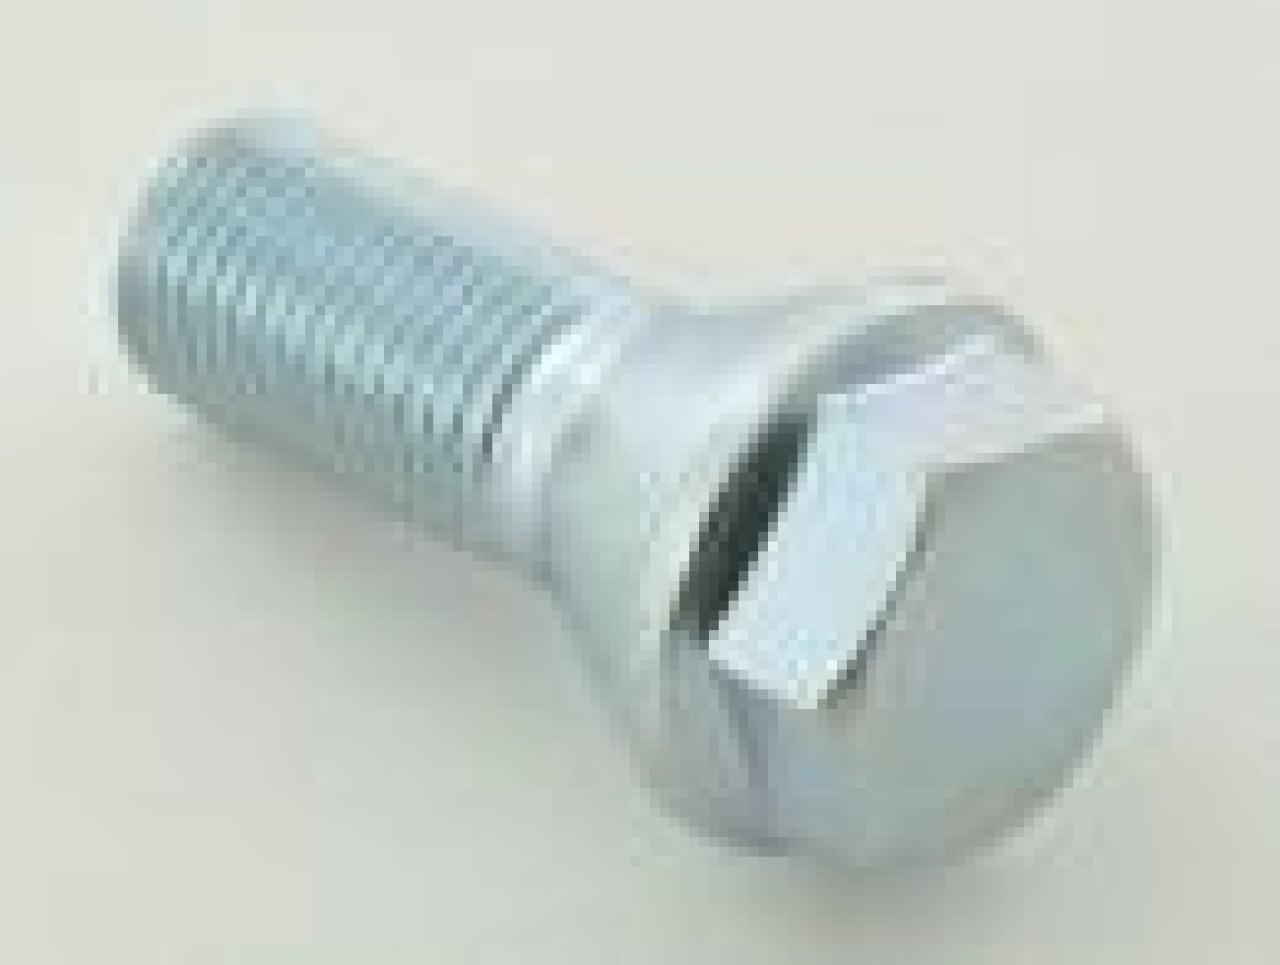 PREZON ROATA METRIC 12 PAS FILET 1,5 20MM CONIC CAP SCURT – COD P121520CSH-17